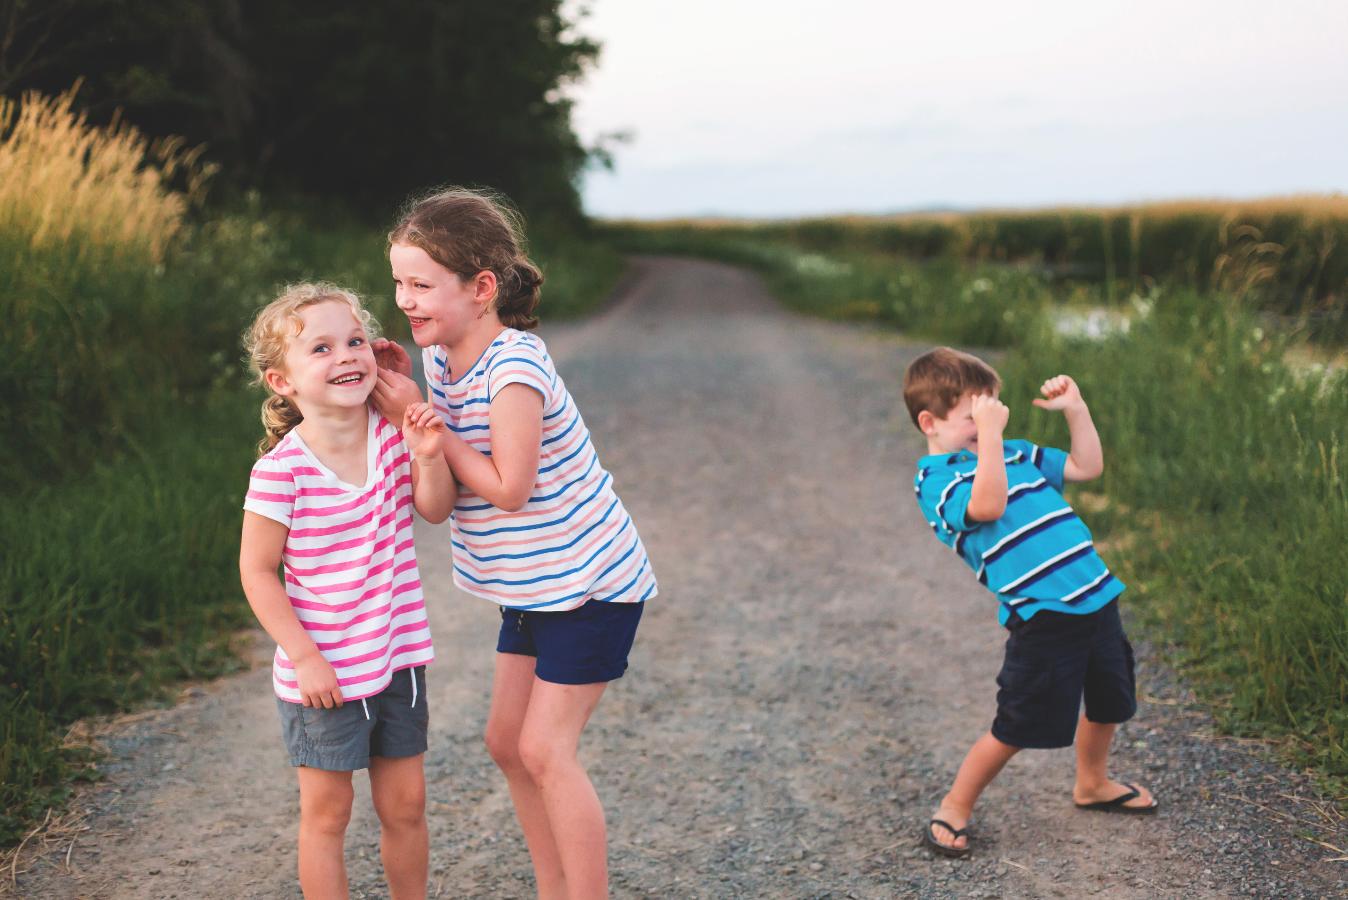 Hamilton-Toronto-Burlington-Oakville-welland-Niagara-Cambridge-Dundas-Ontario-Family-photographer-photography-Moments-by-Lauren-Nova-Scotia-Antigonish-Lifestyle-Session-Image-Photo-24.png